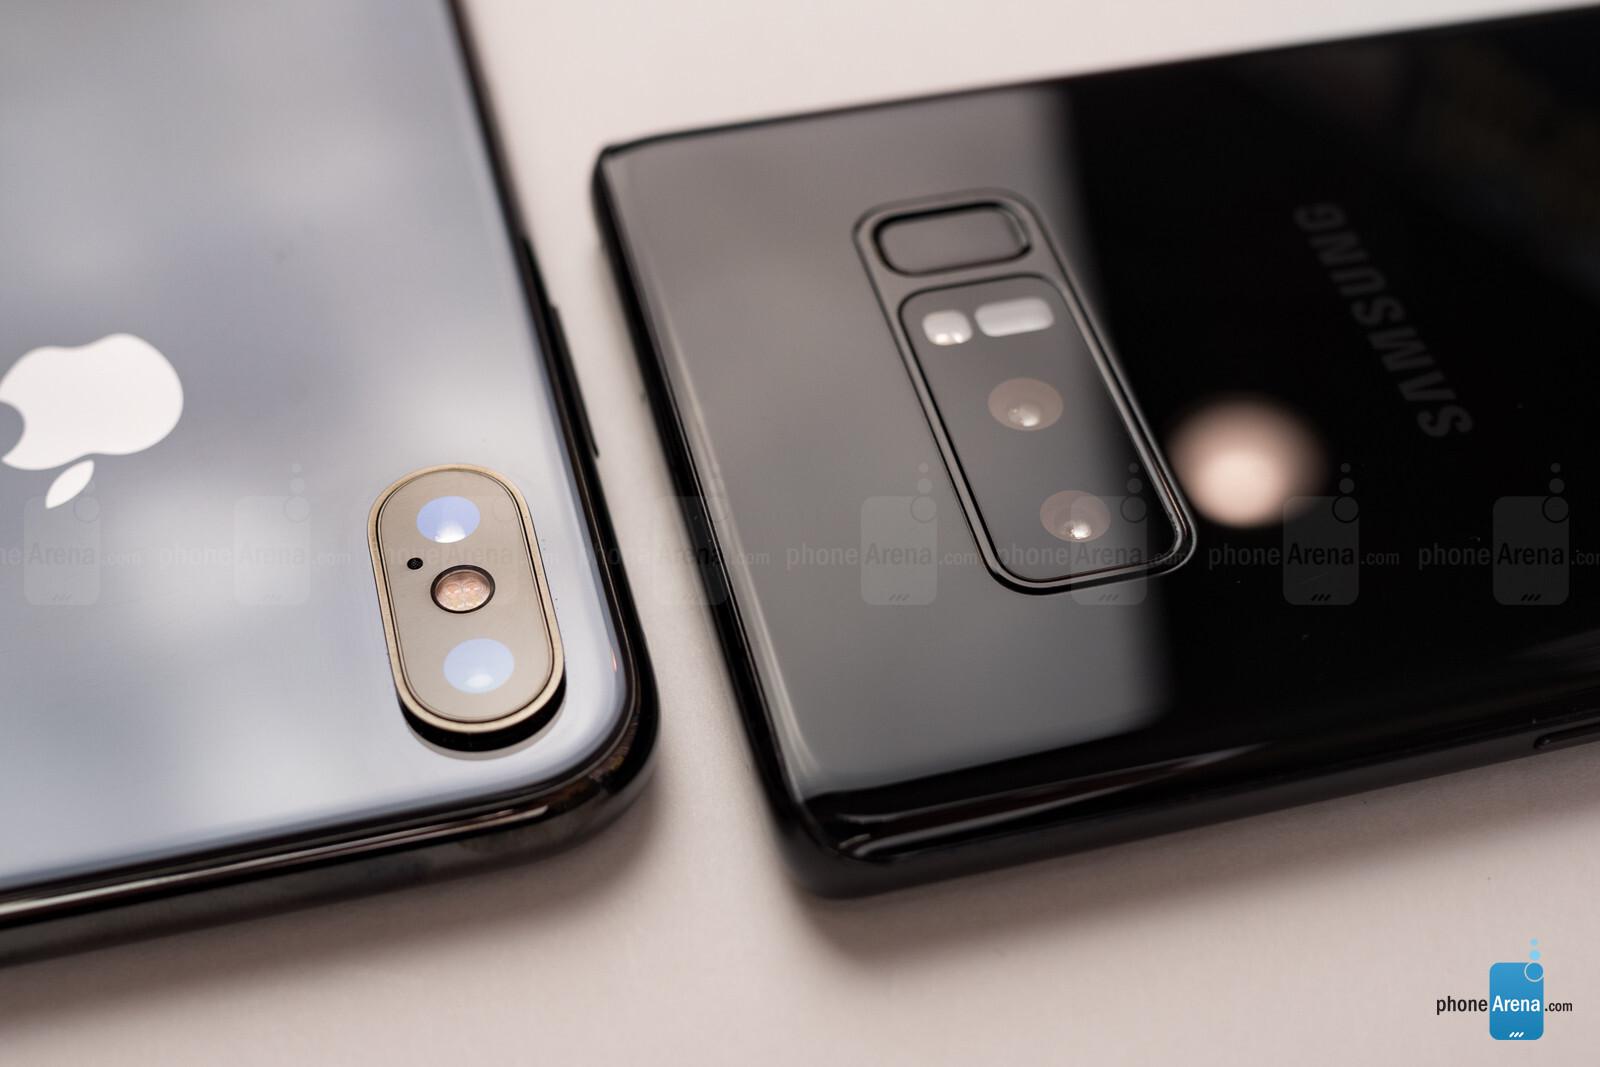 iPhone 6 vs Galaxy S5 vs HTC One M8: Camera shootout ...